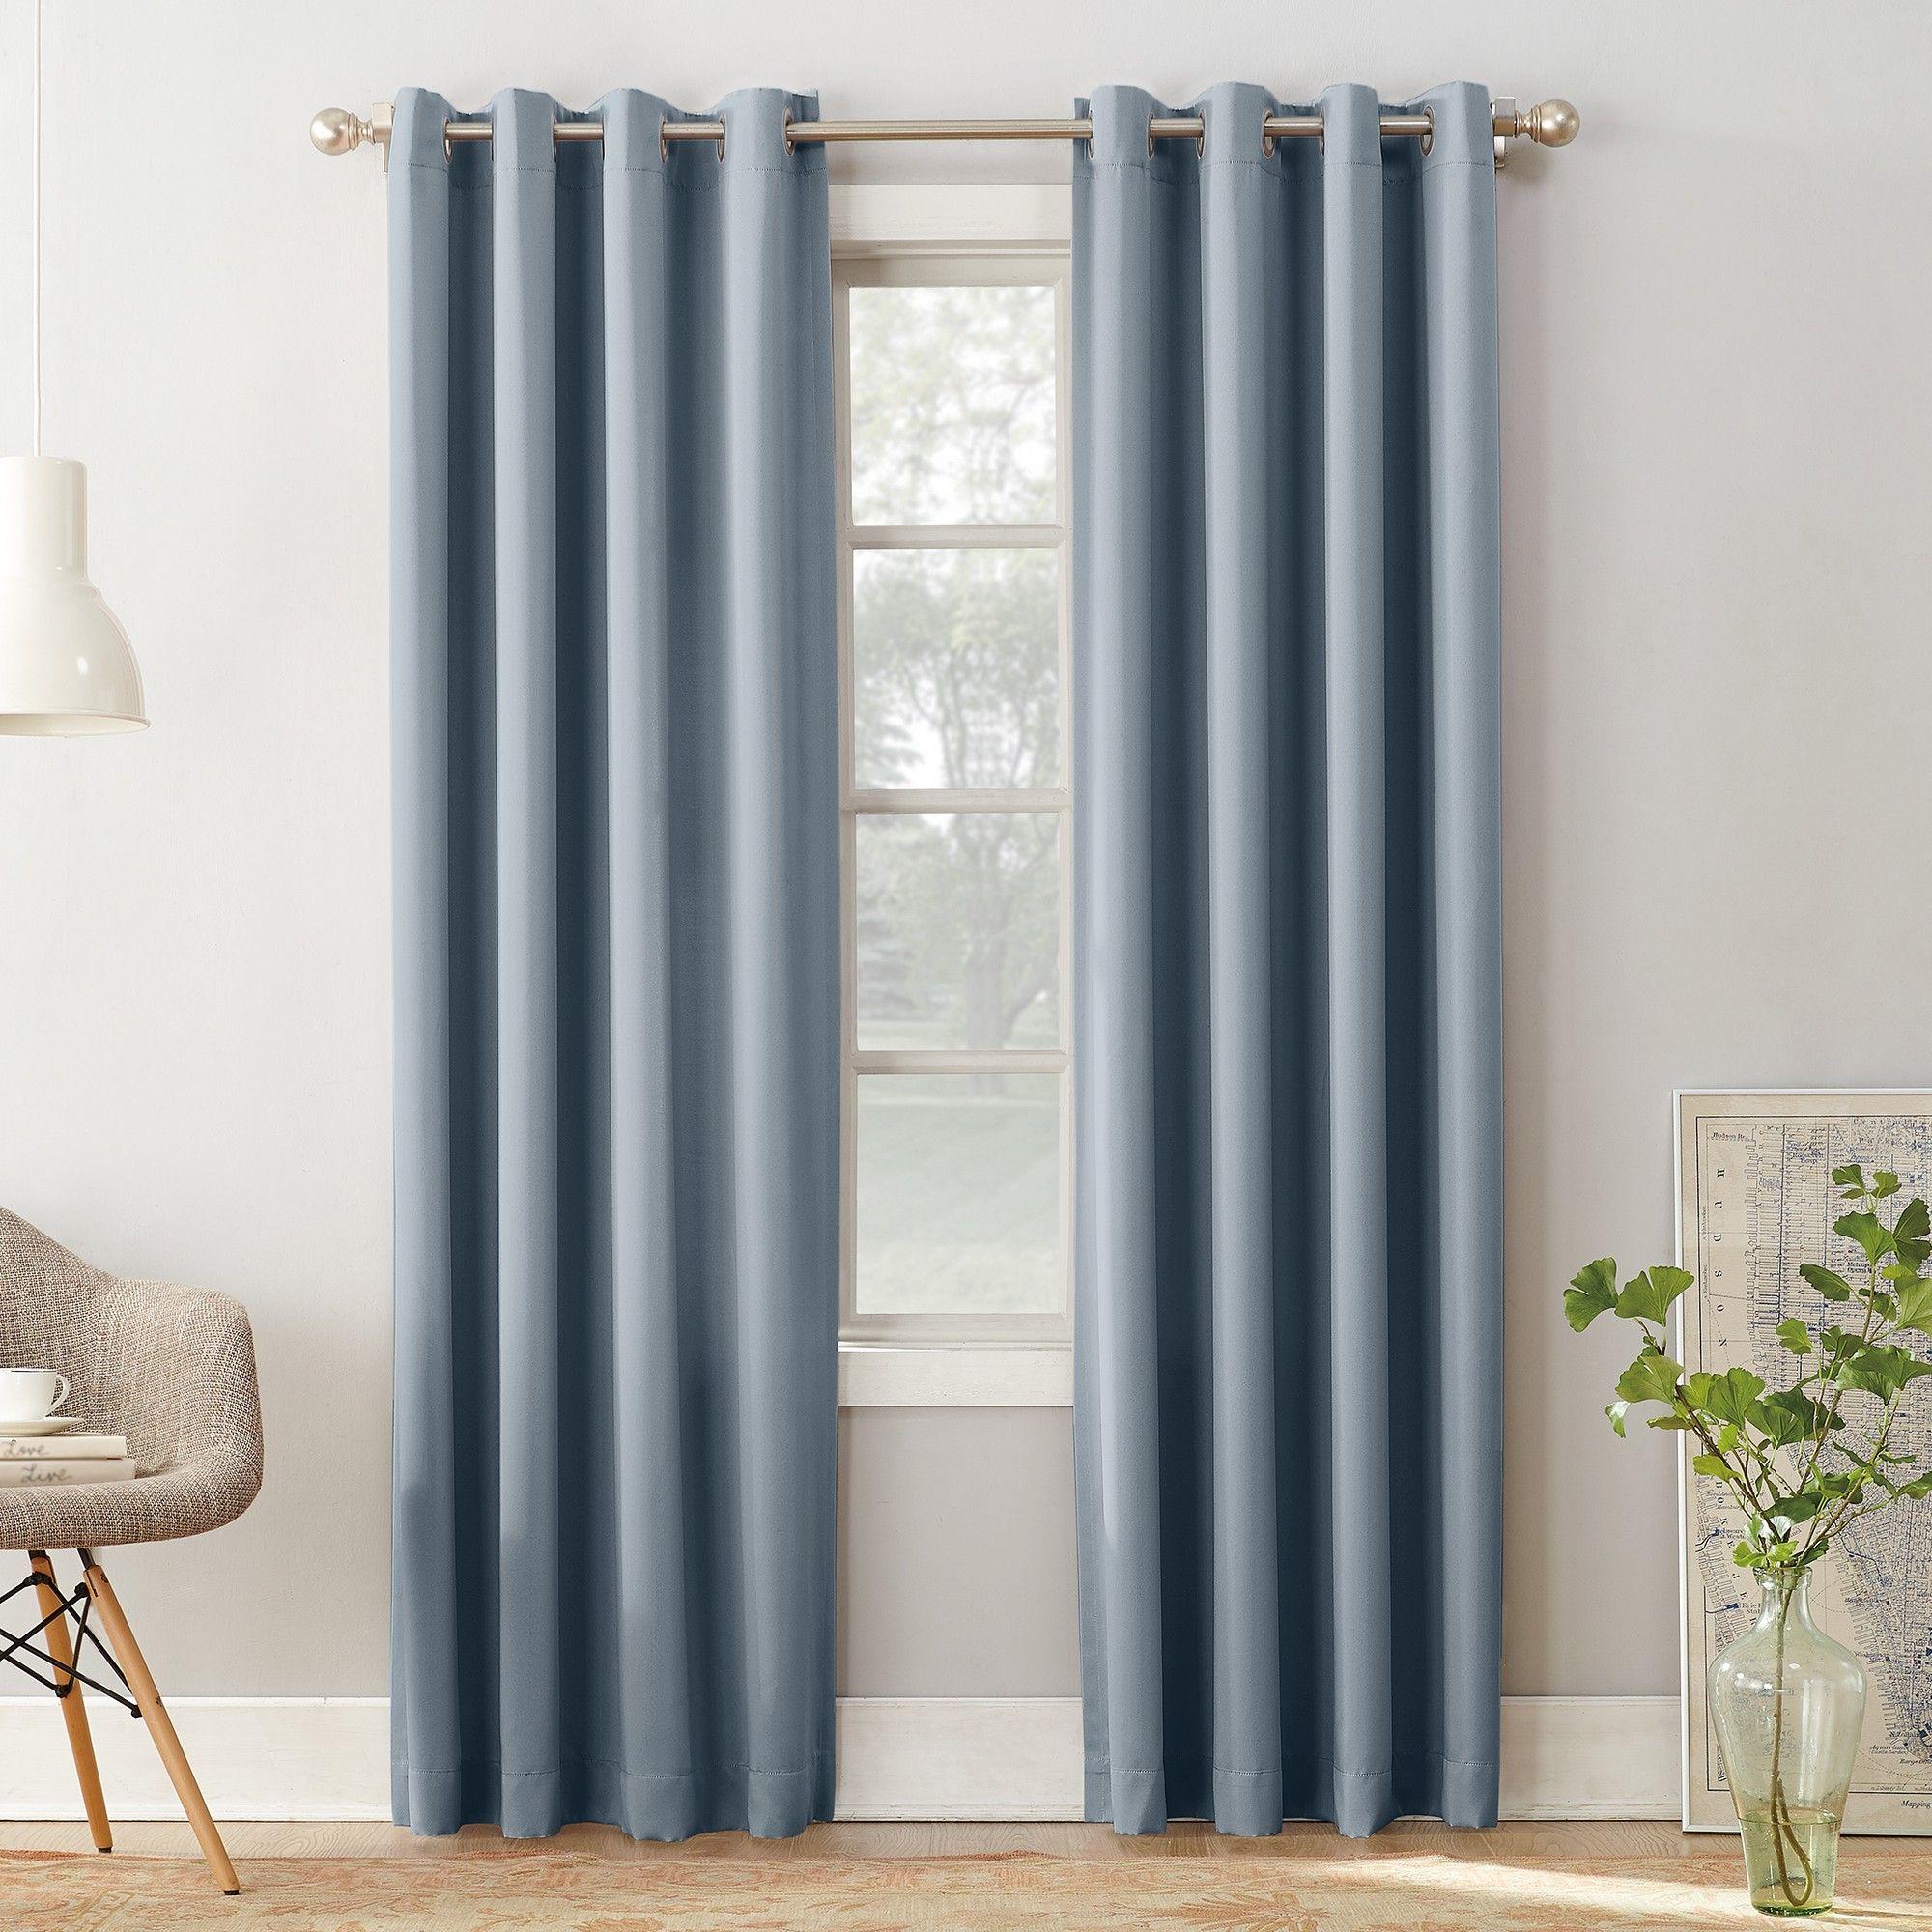 "Seymour Room Darkening Grommet Curtain Panel Vintage Blue 54""x63"